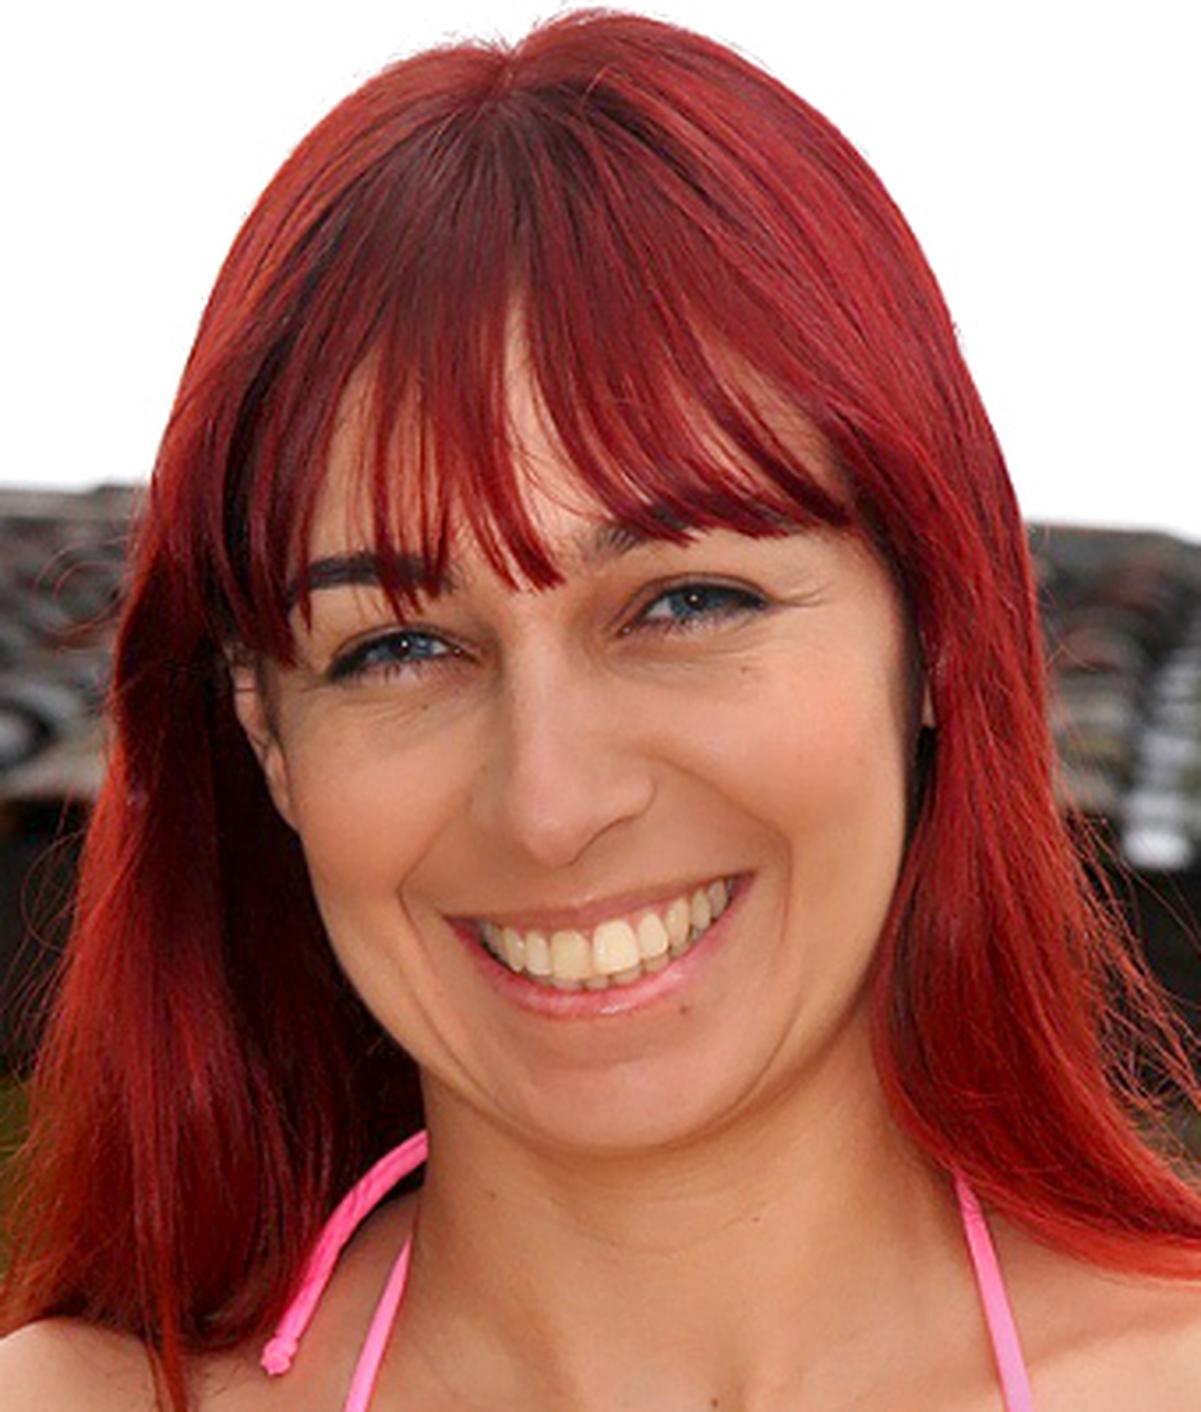 Sheyla Dantas wiki, Sheyla Dantas bio, Sheyla Dantas news